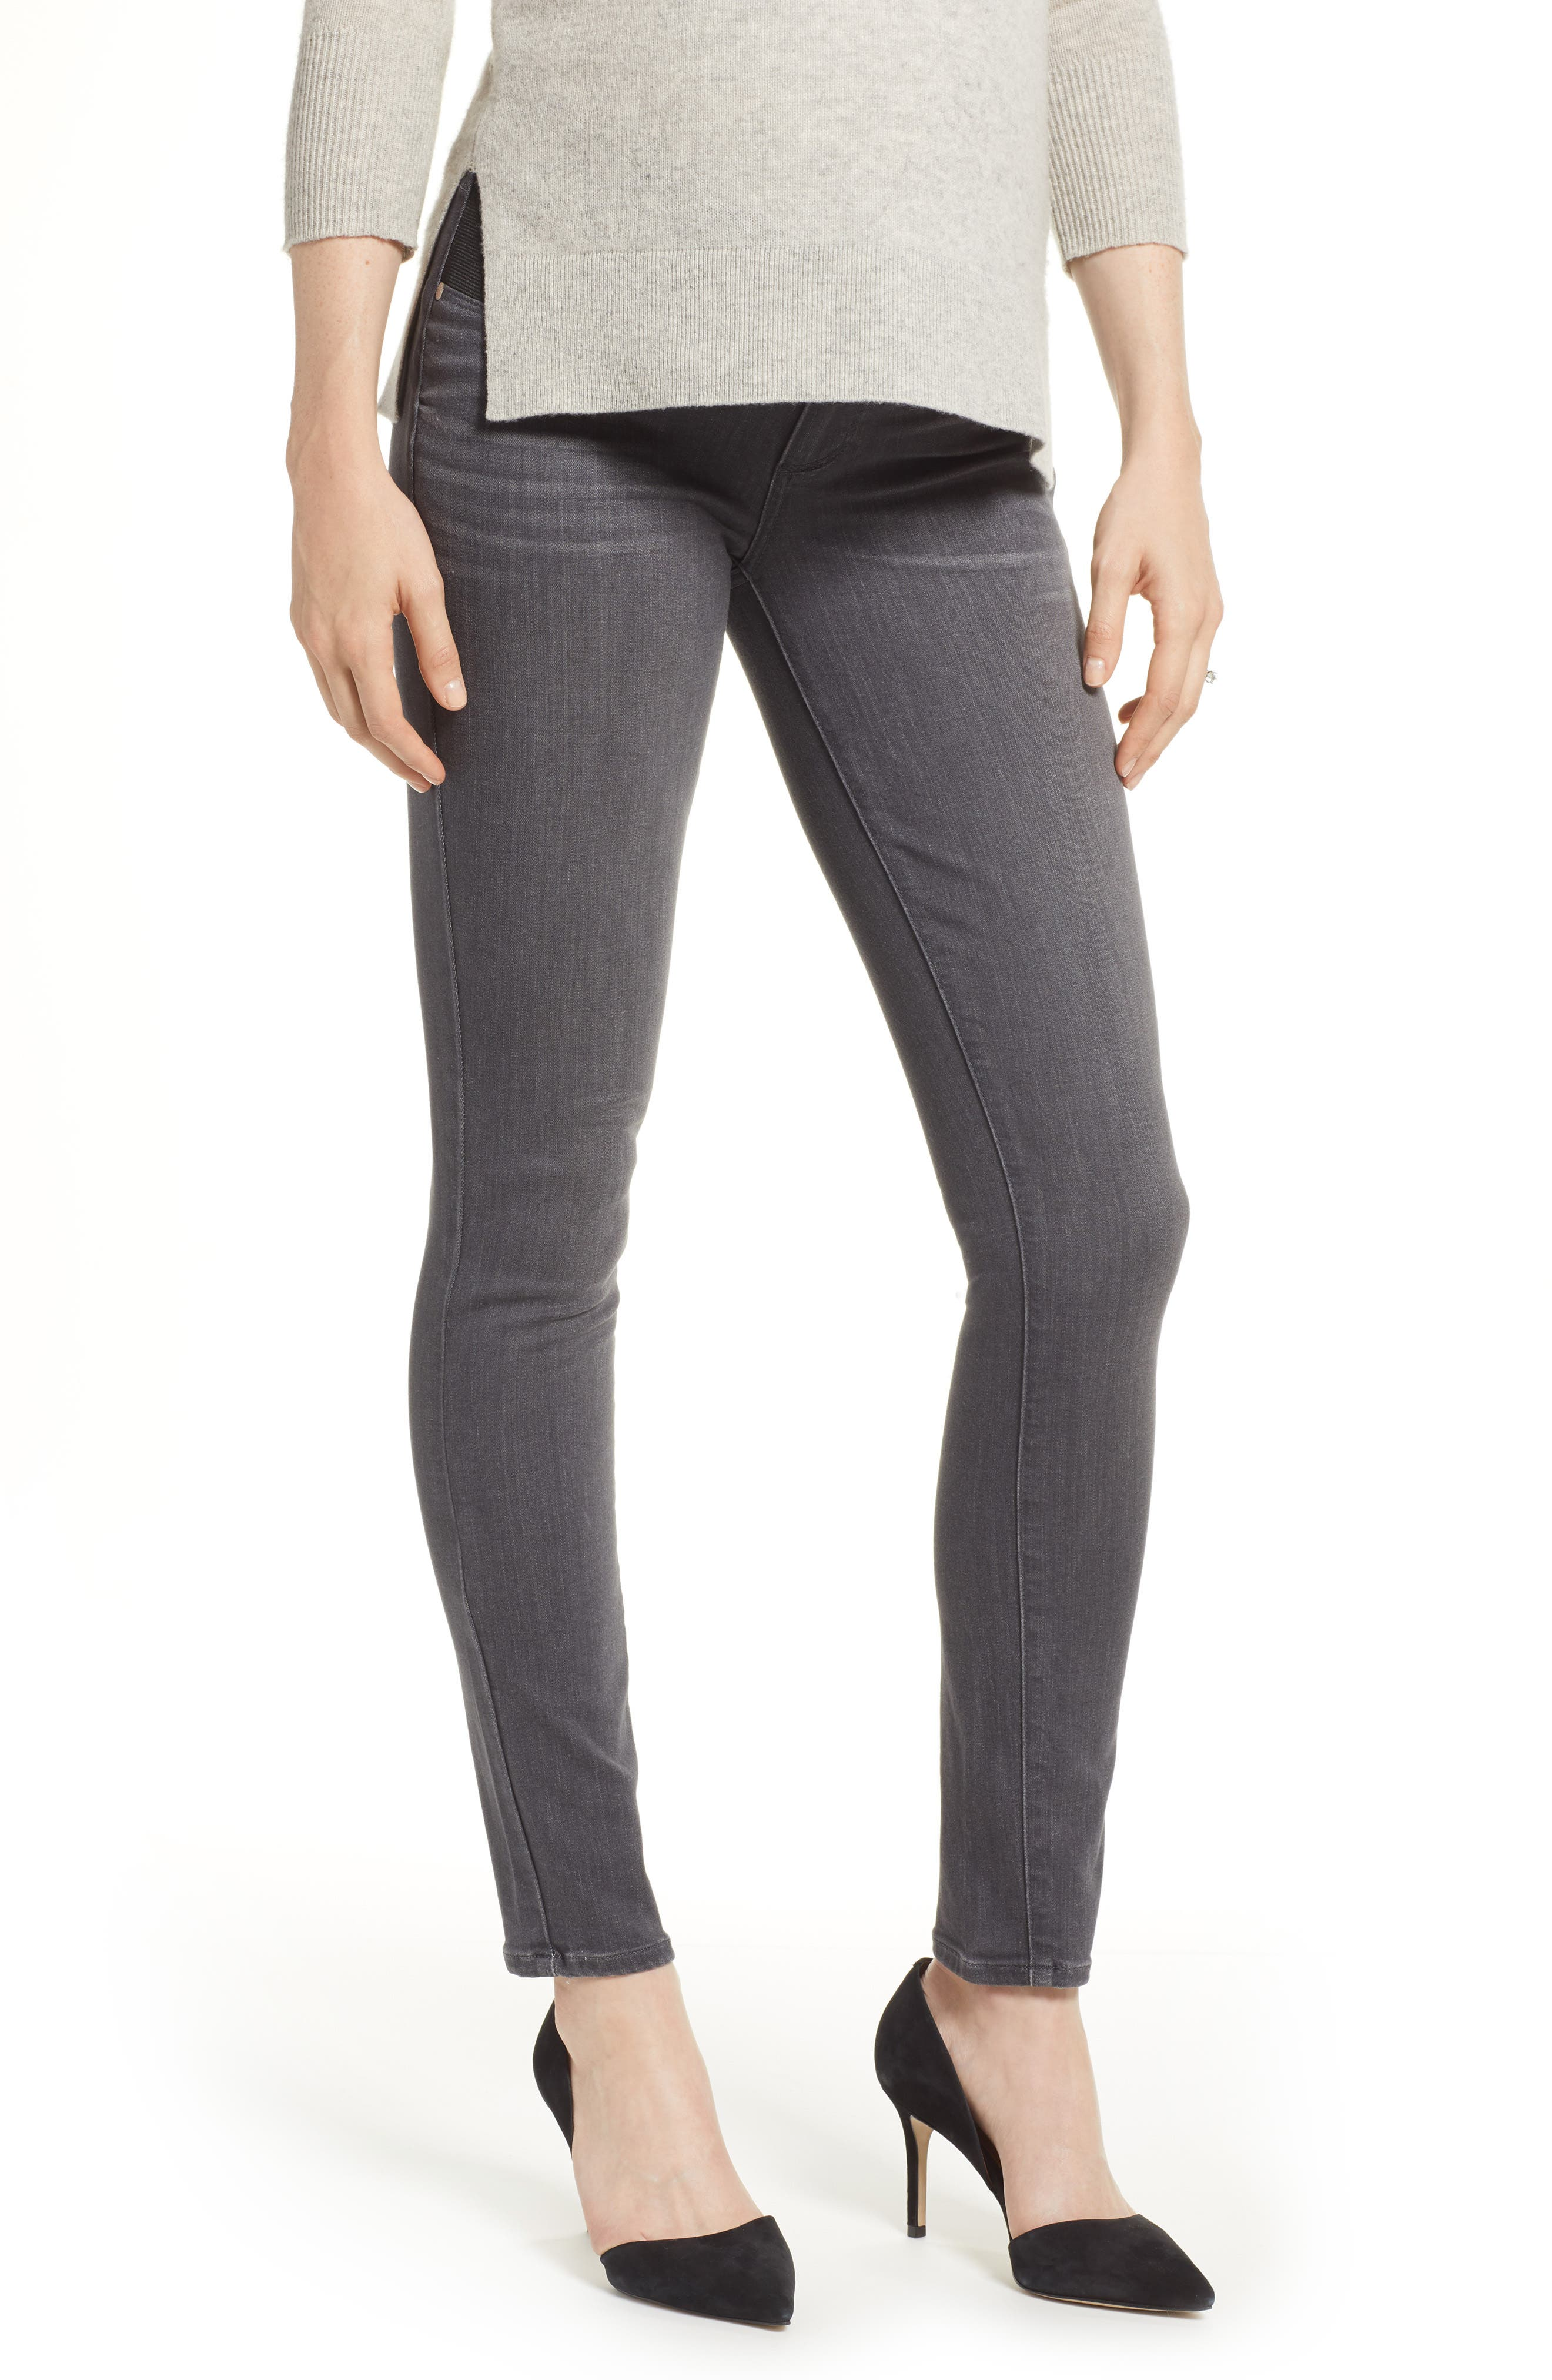 Transcend - Verdugo Maternity Skinny Jeans,                             Main thumbnail 1, color,                             GREY PEAKS